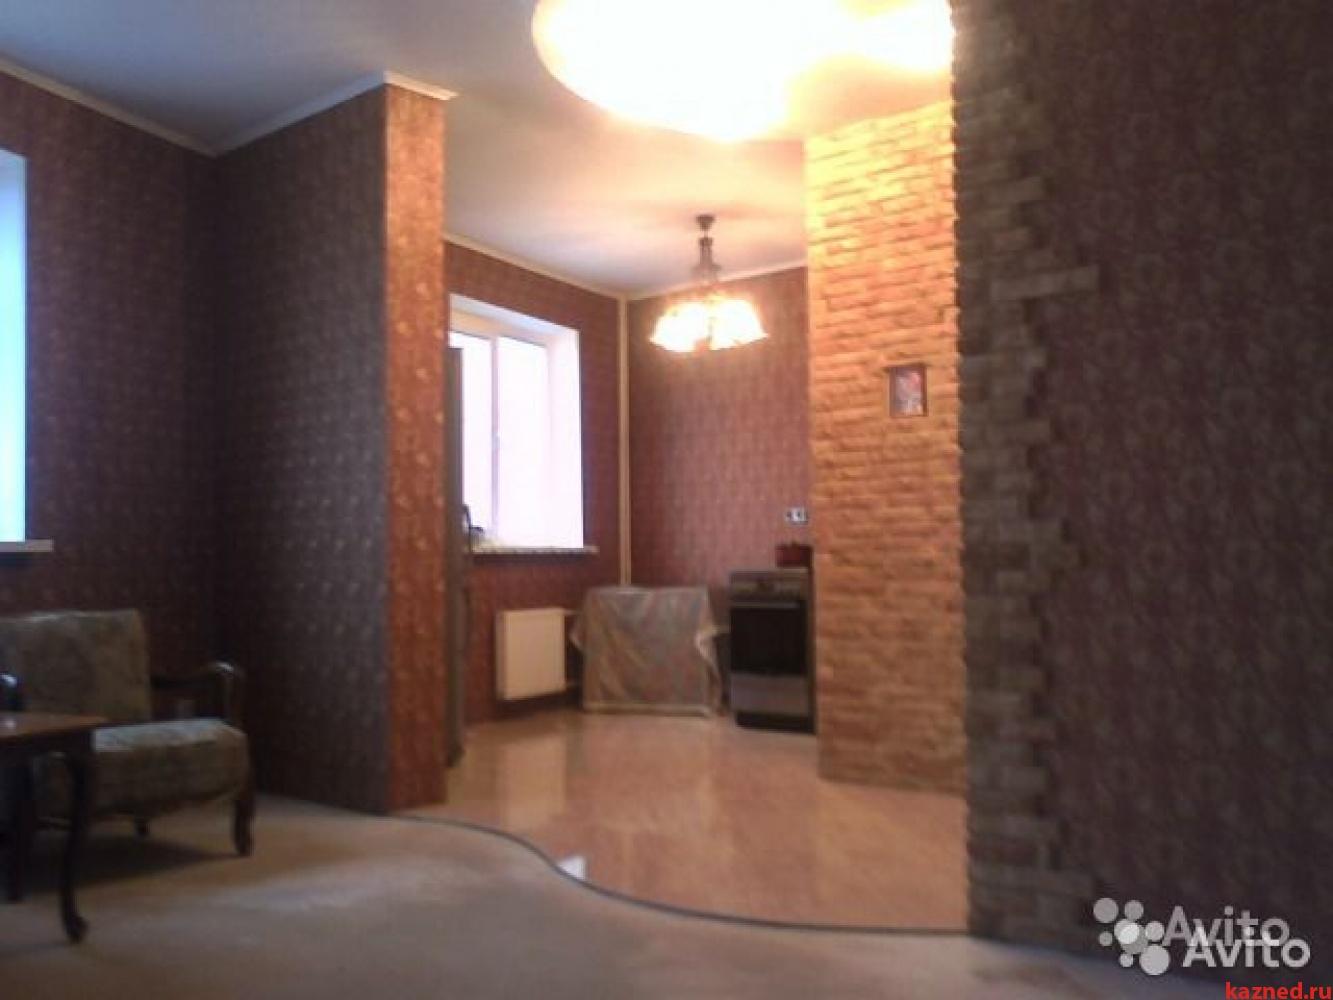 Продажа 2-к квартиры Юлиуса Фучика, 2Б, 66 м2  (миниатюра №2)